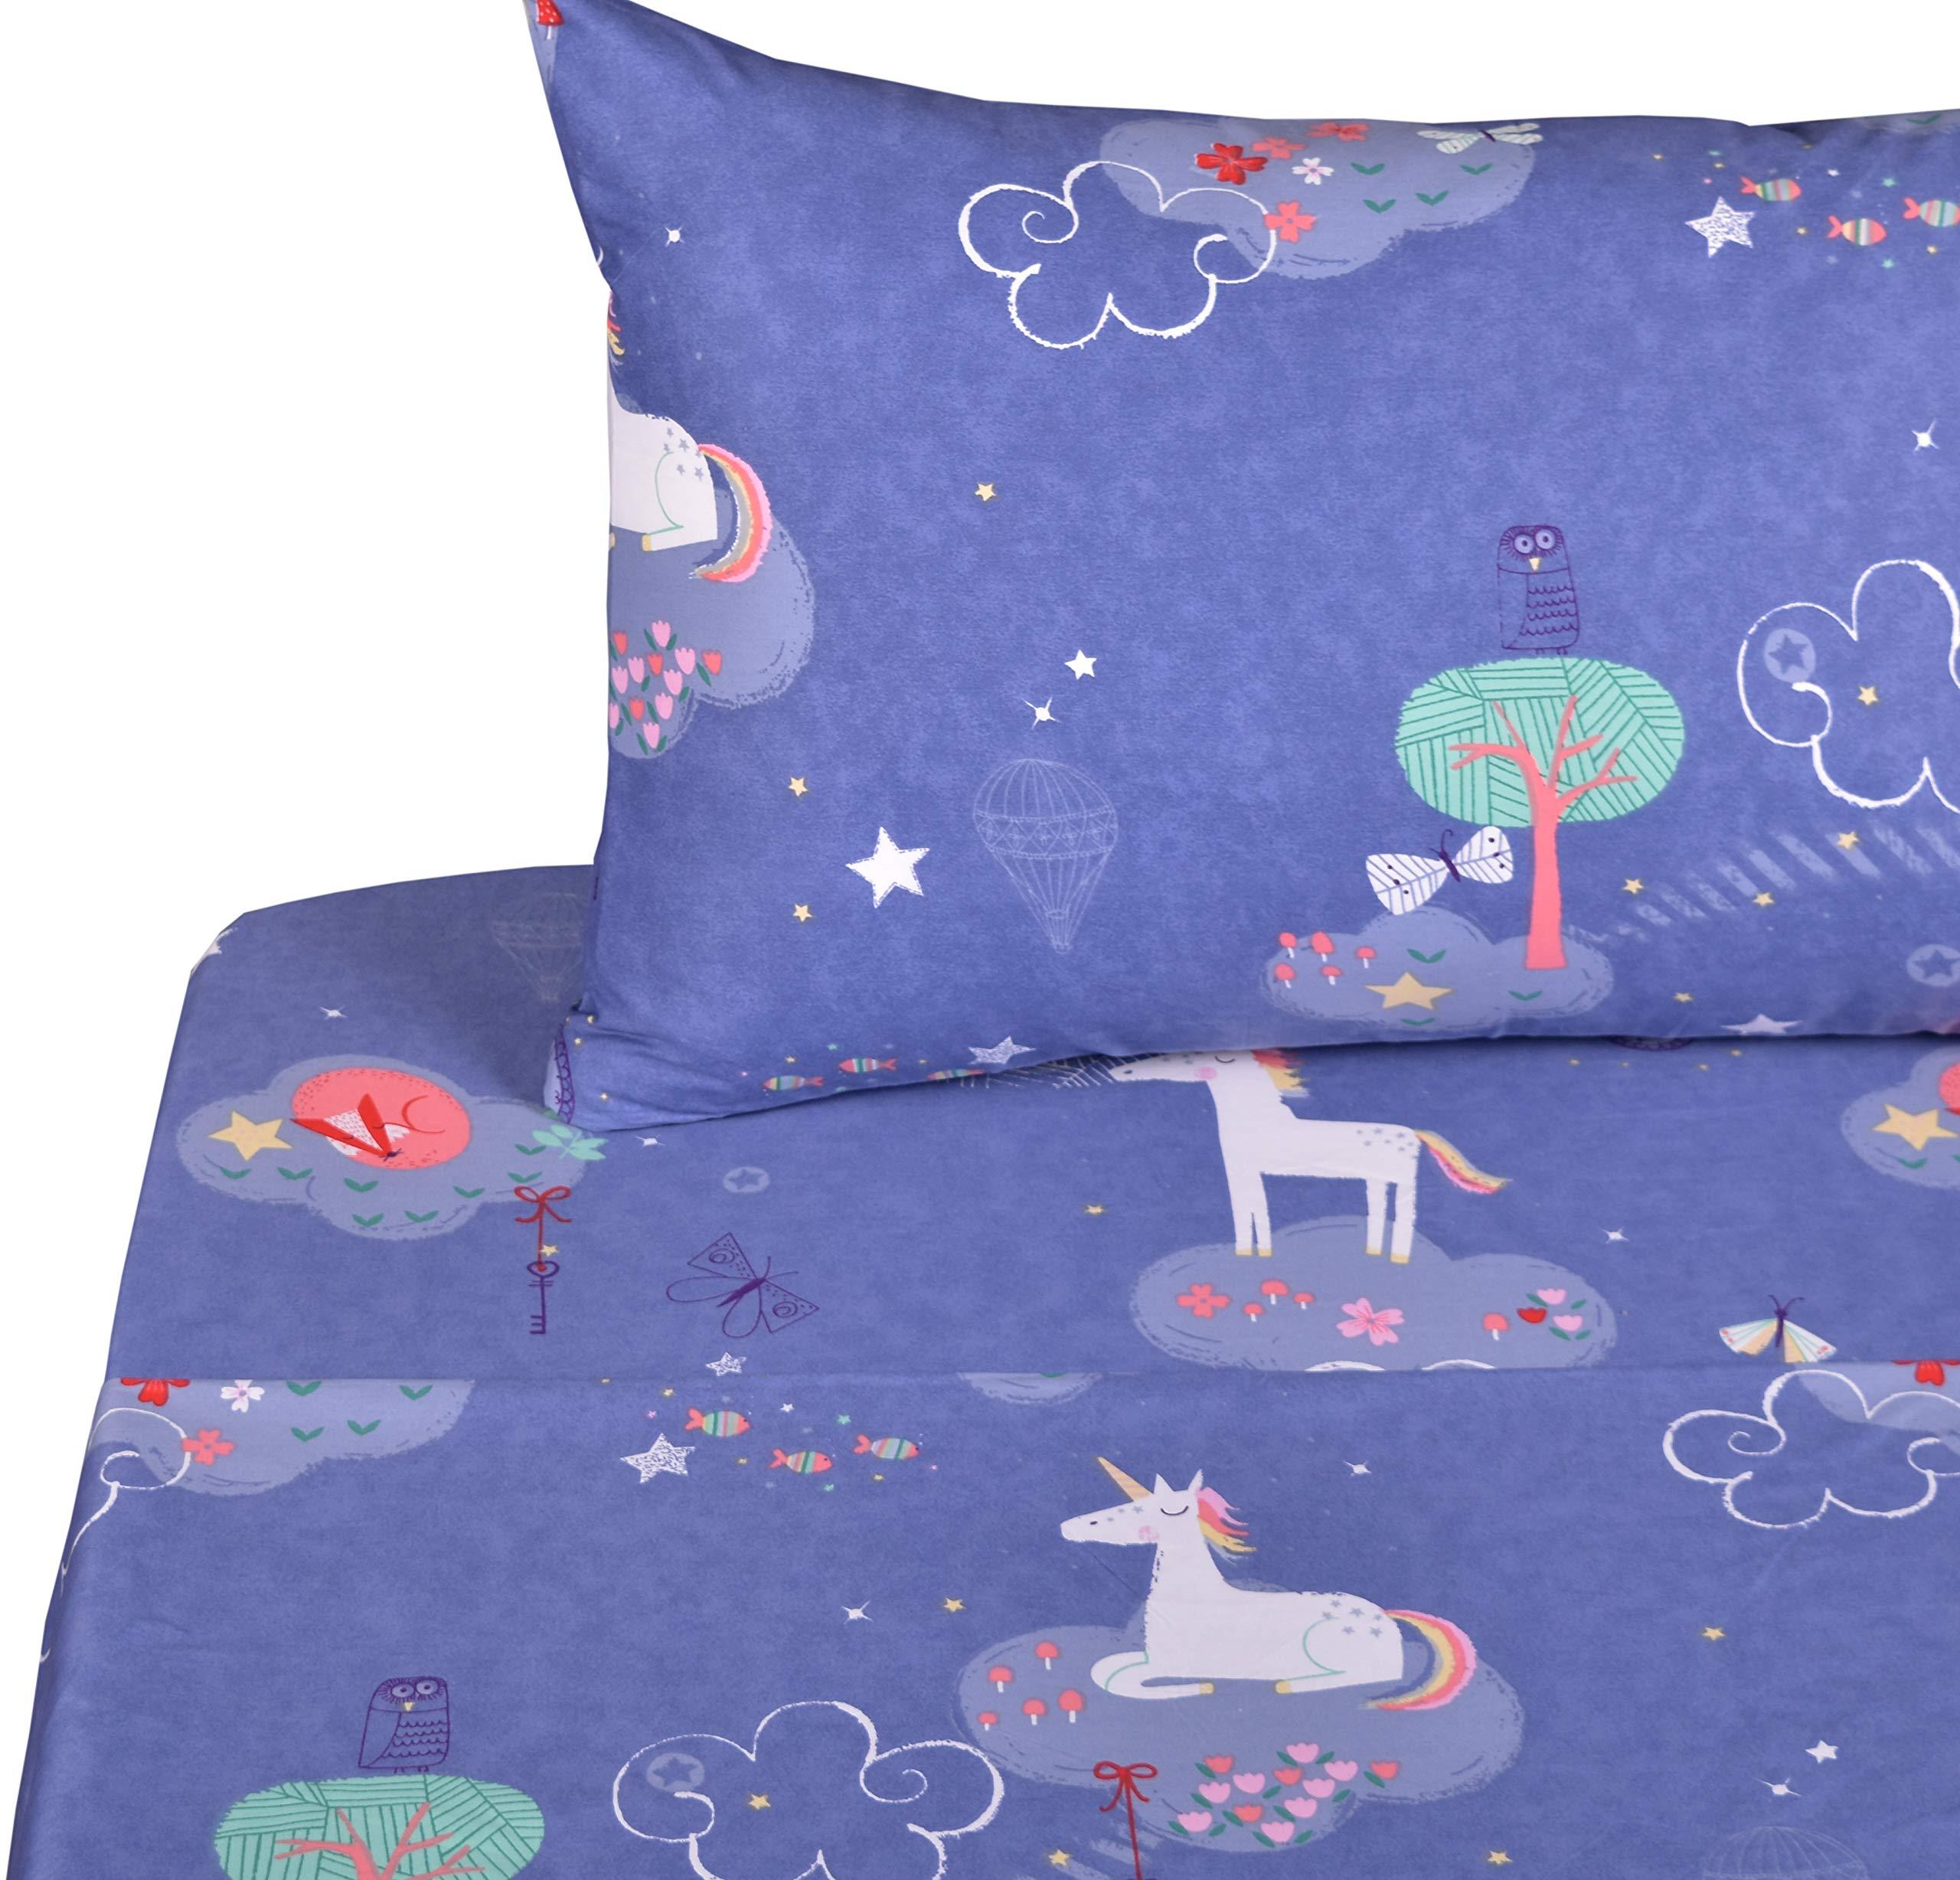 J-pinno Unicorn Dreaming Playing Full Sheet Set for Kids Girl Children,100% Cotton, Flat Sheet + Fitted Sheet + Two Pillowcase Bedding Set (3) by J-pinno